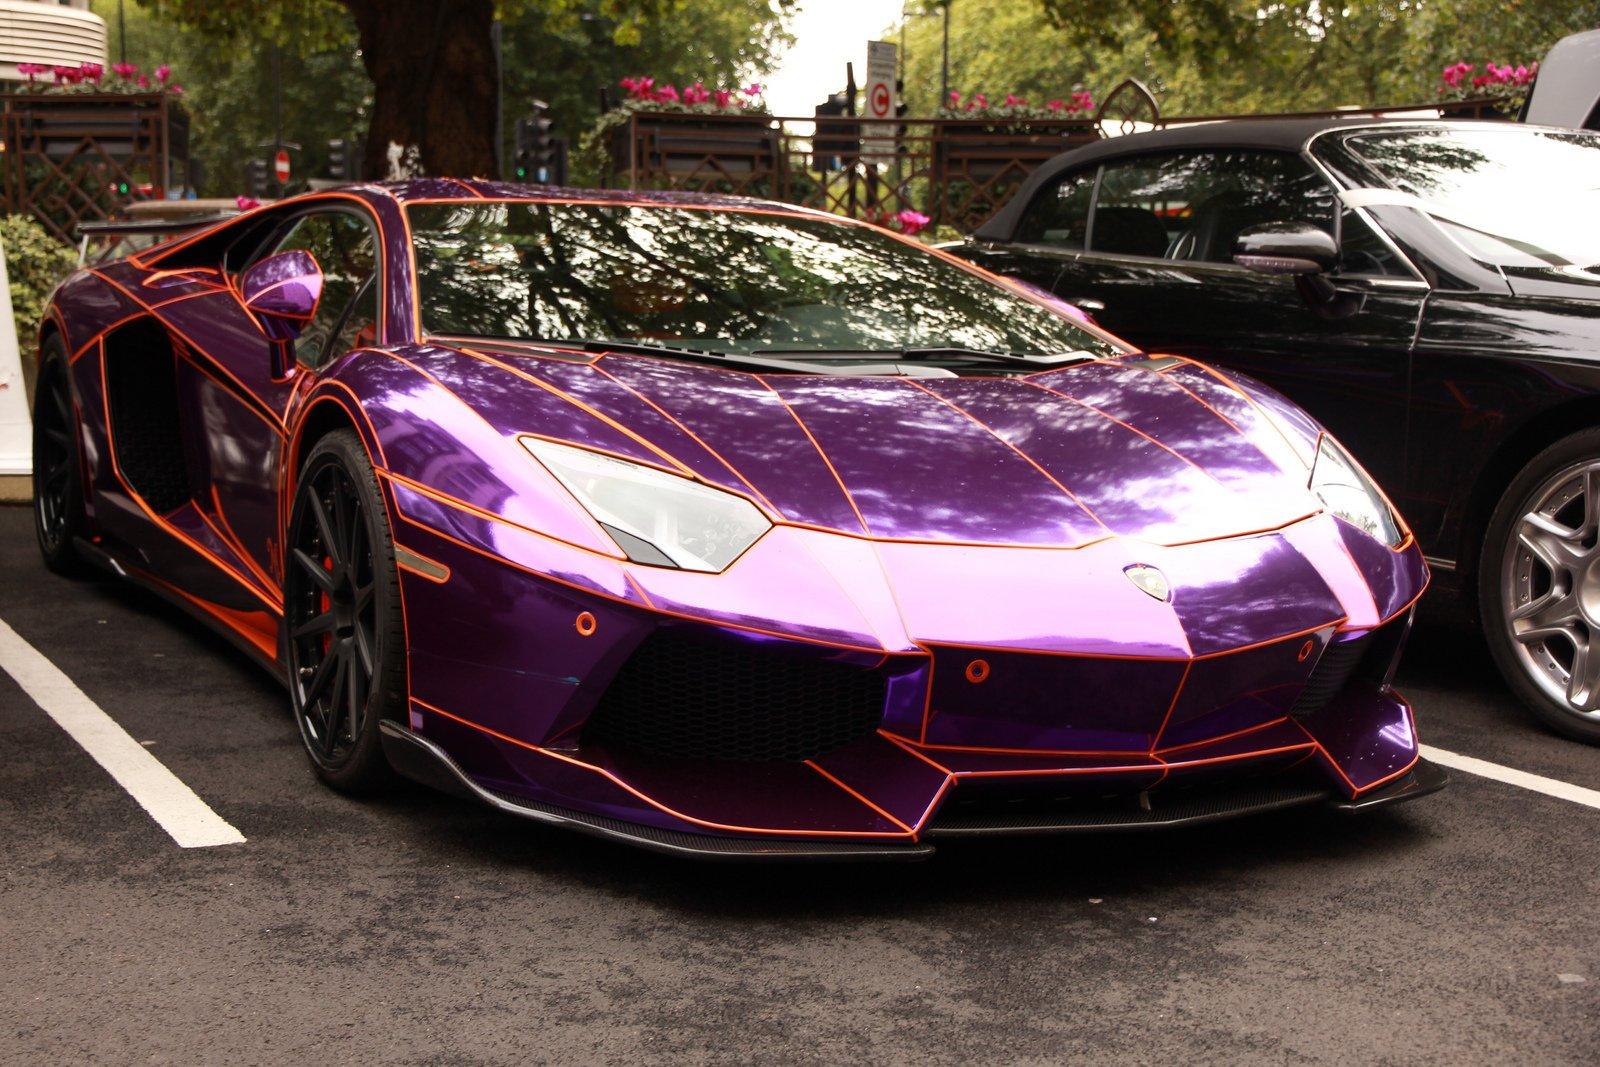 Purple Lamborghini Aventador Pictures To Pin On Pinterest